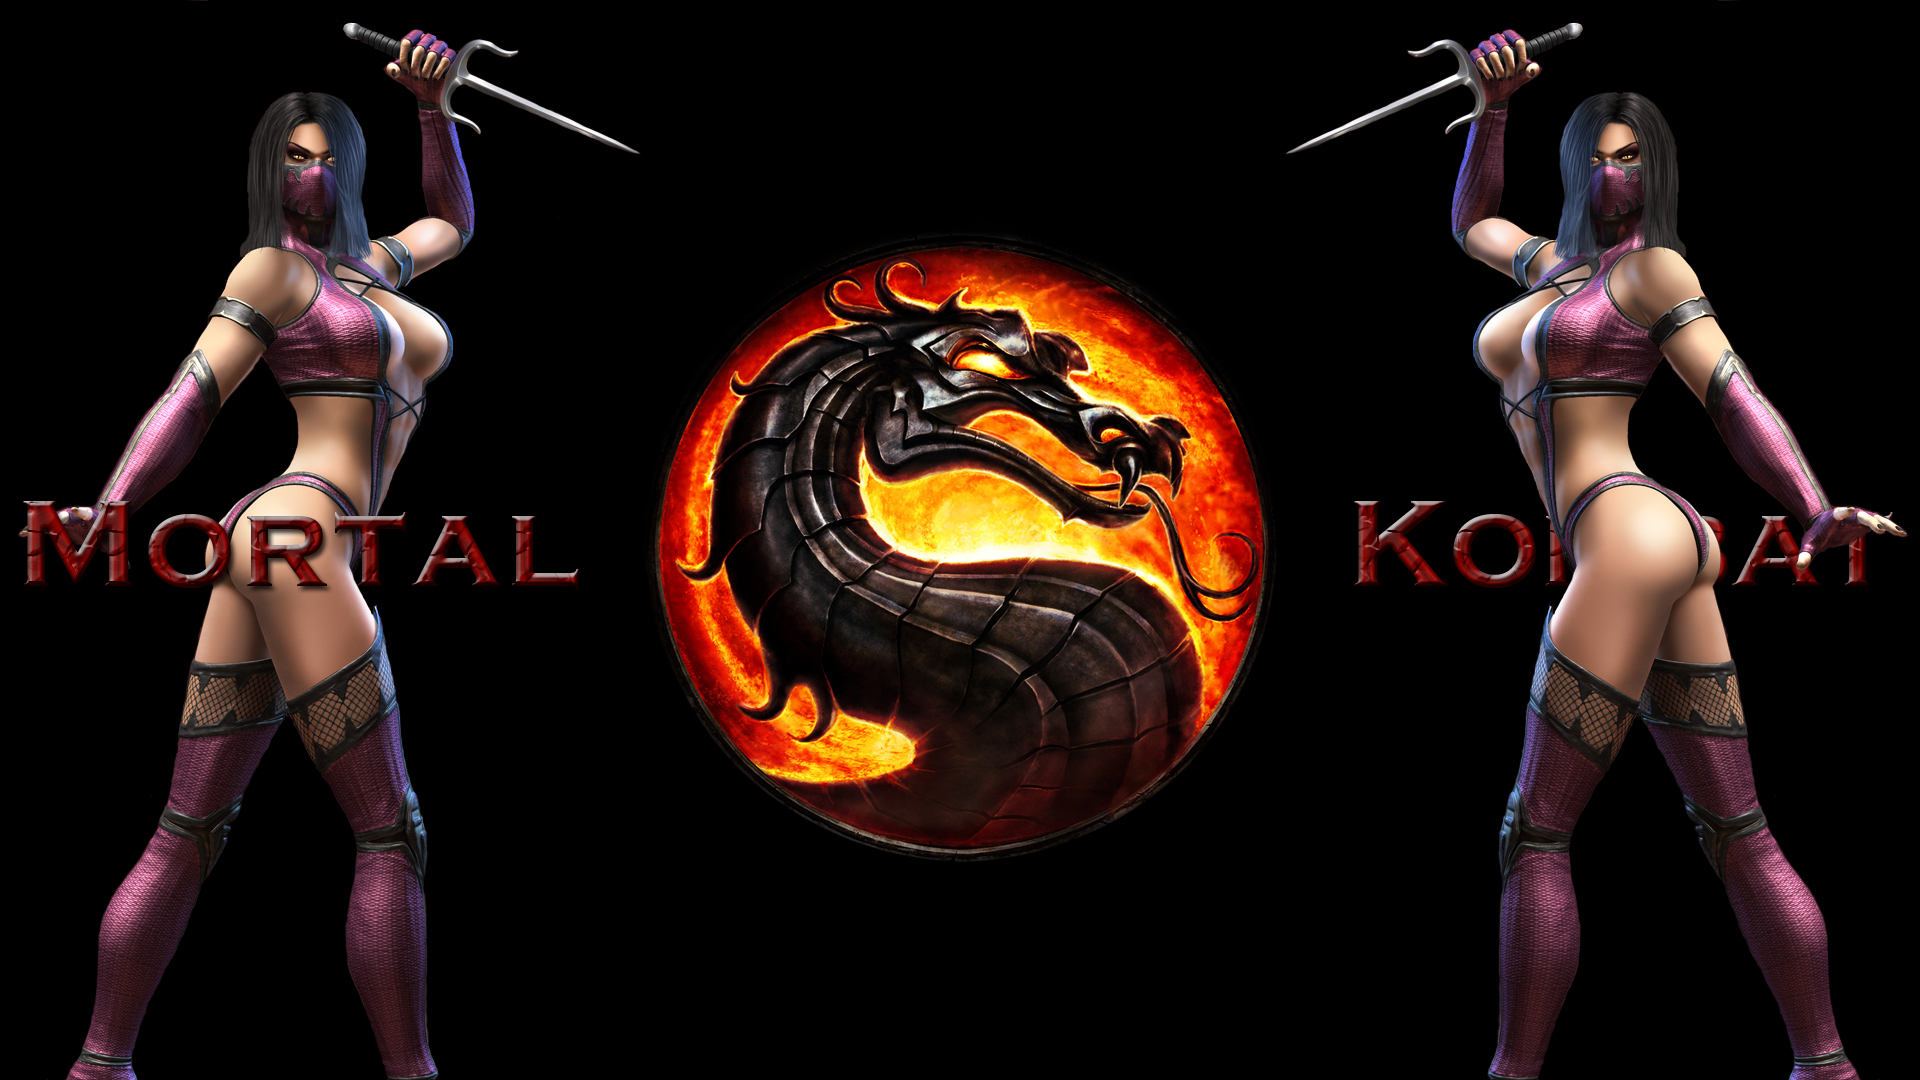 mortal kombat logo HD Wallpaper   Companies Brands 1000679 1920x1080